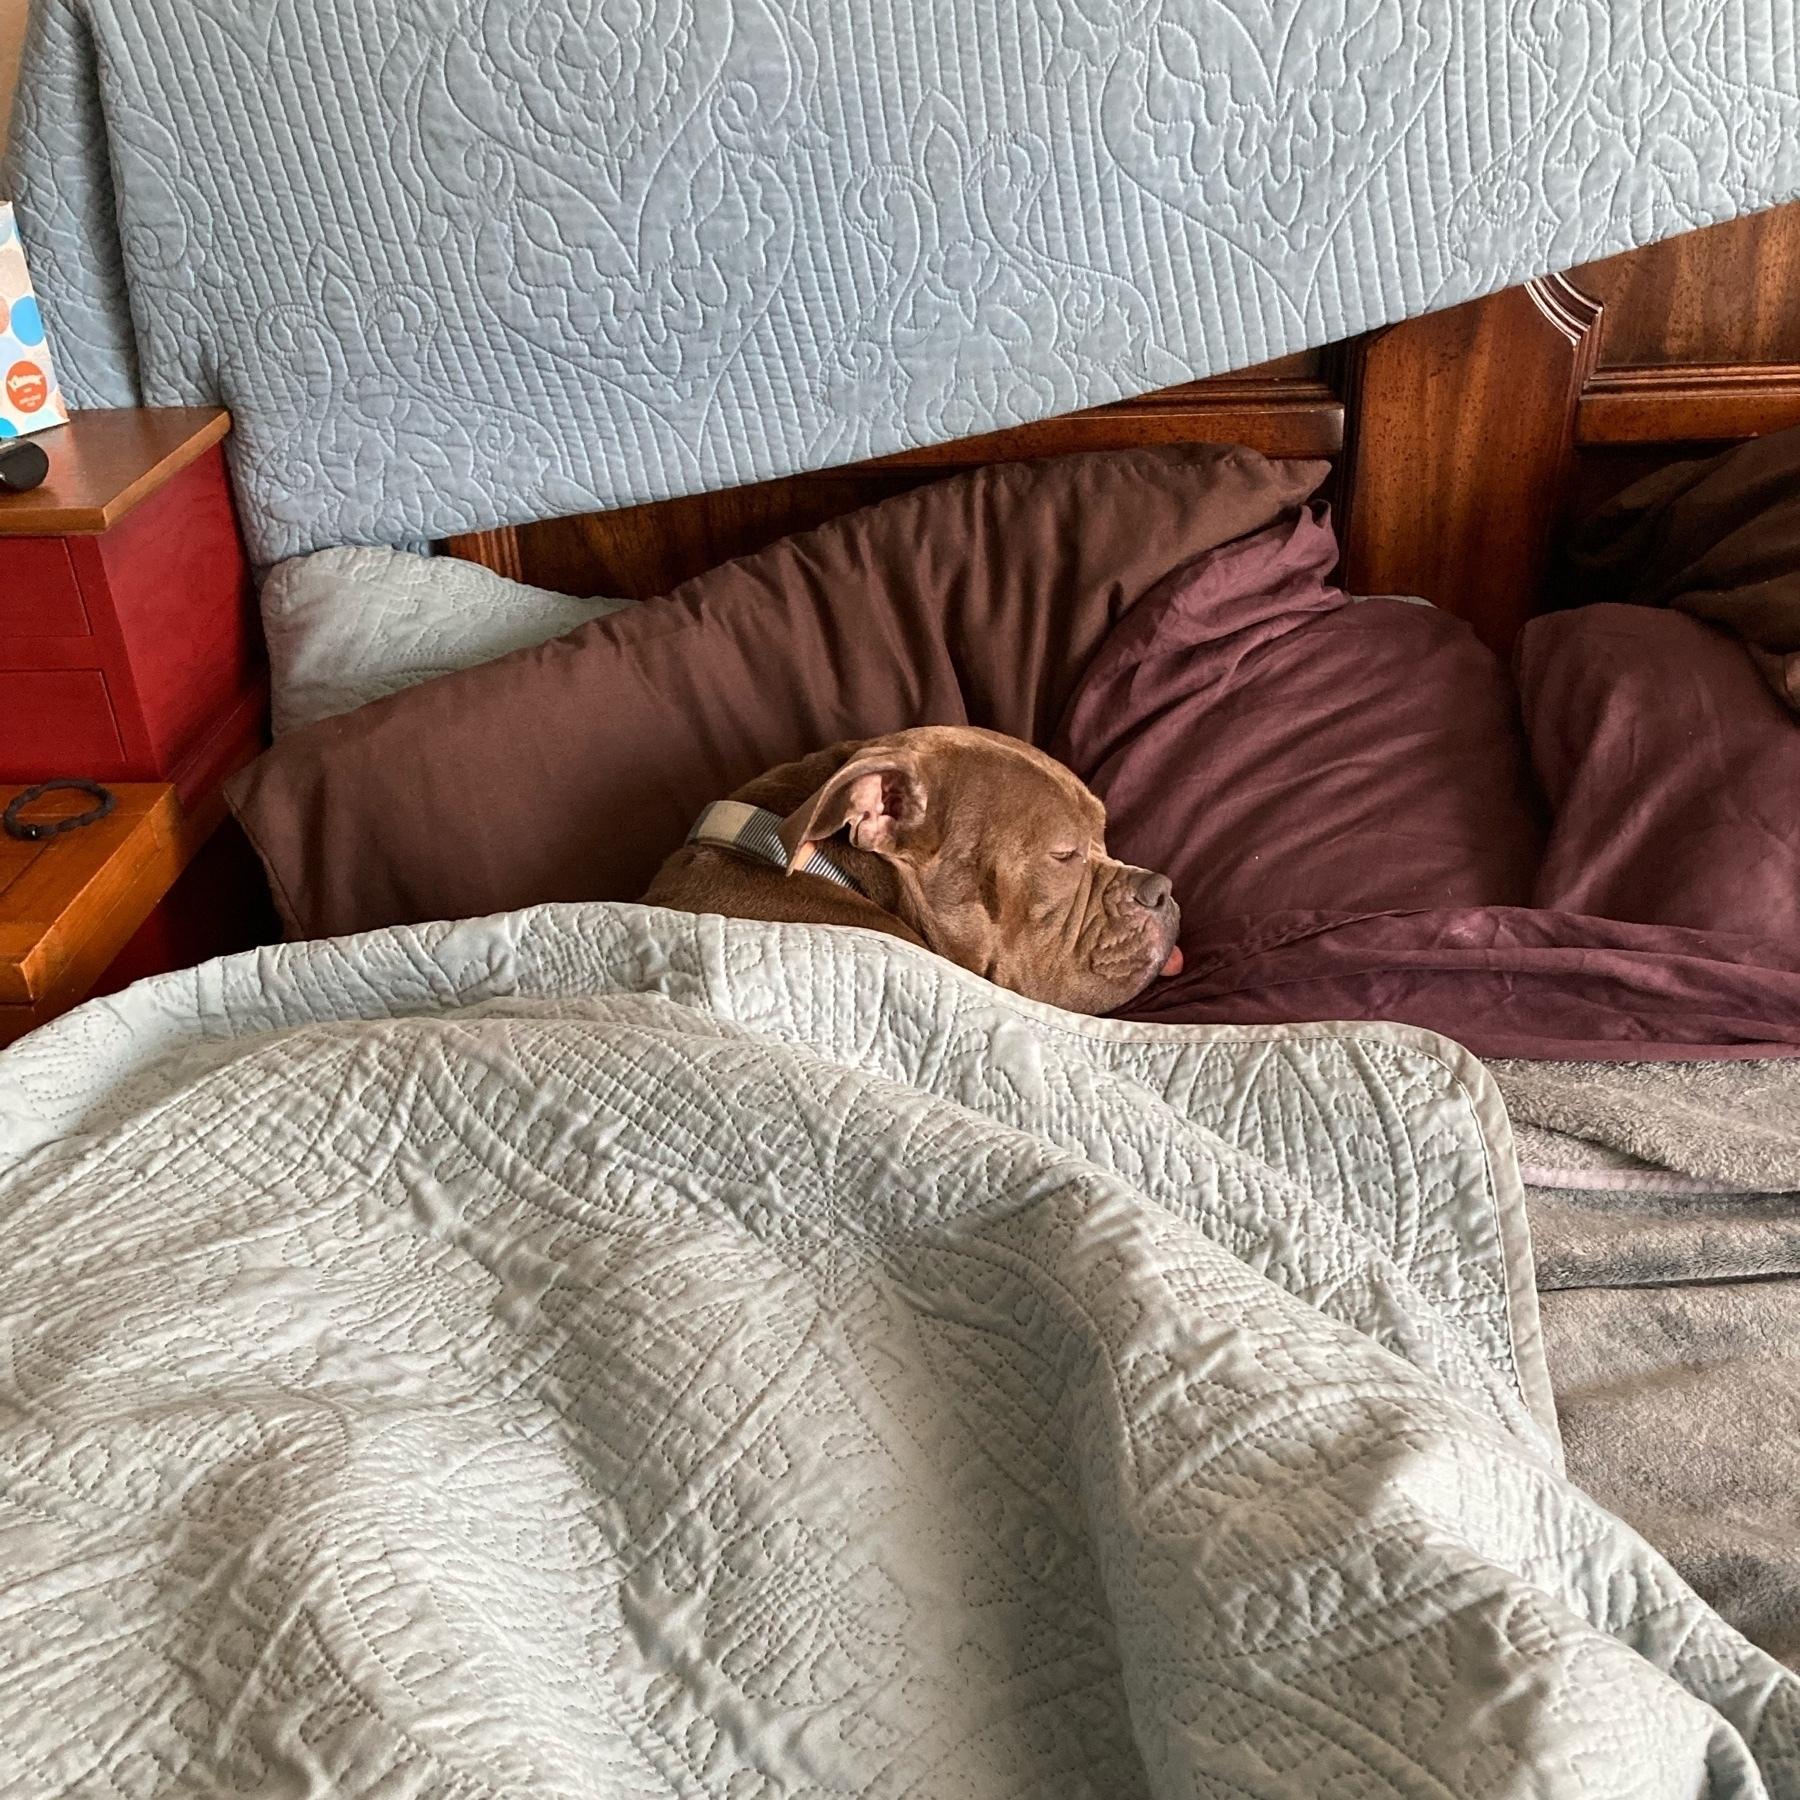 Dog sleeping in bed.